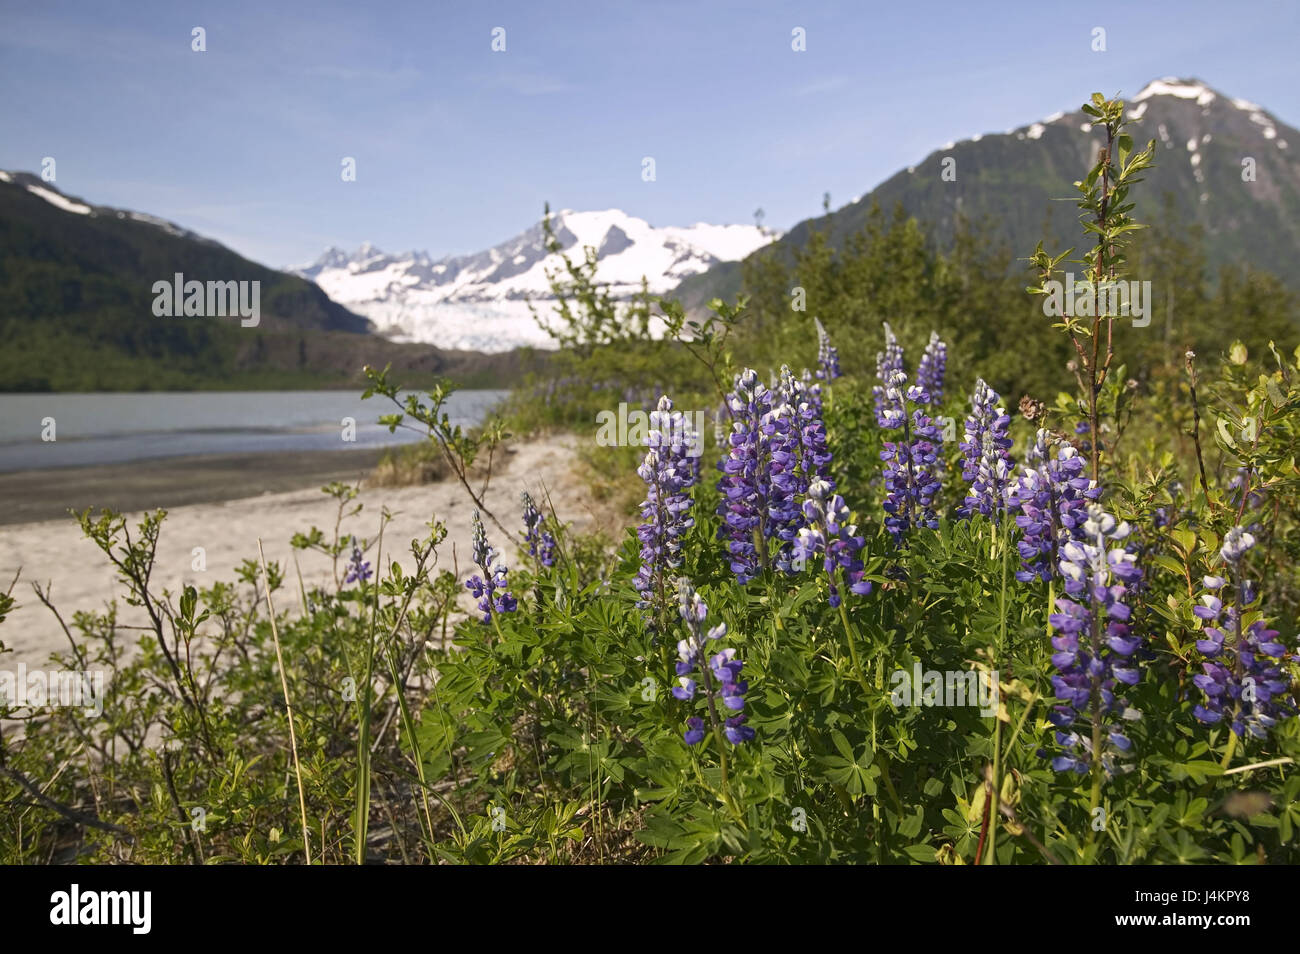 The USA, Alaska, Inside passage, Juneau, Mendenhall brine, shore, lupins, blossom North America, the United States - Stock Image